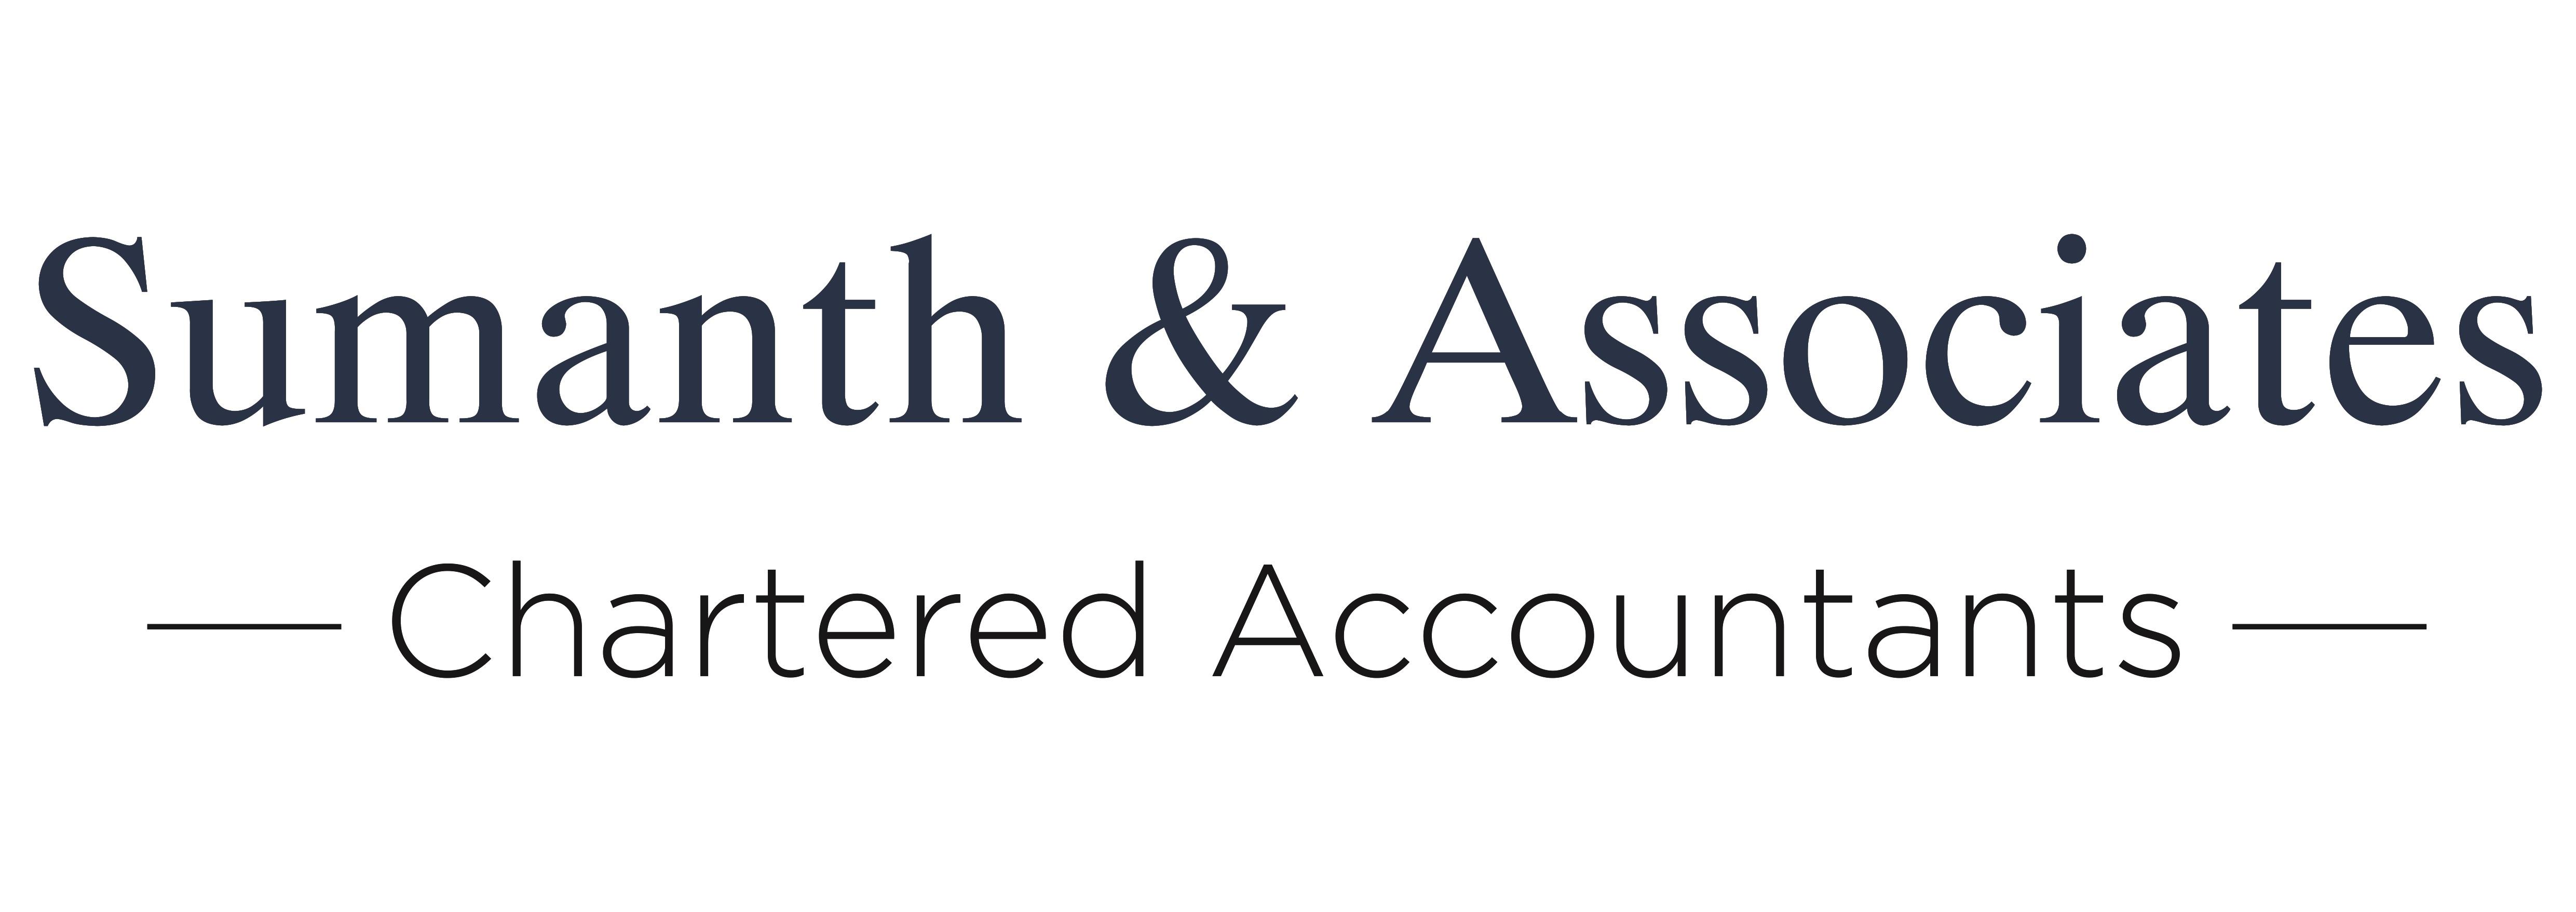 Sumanth & Associates